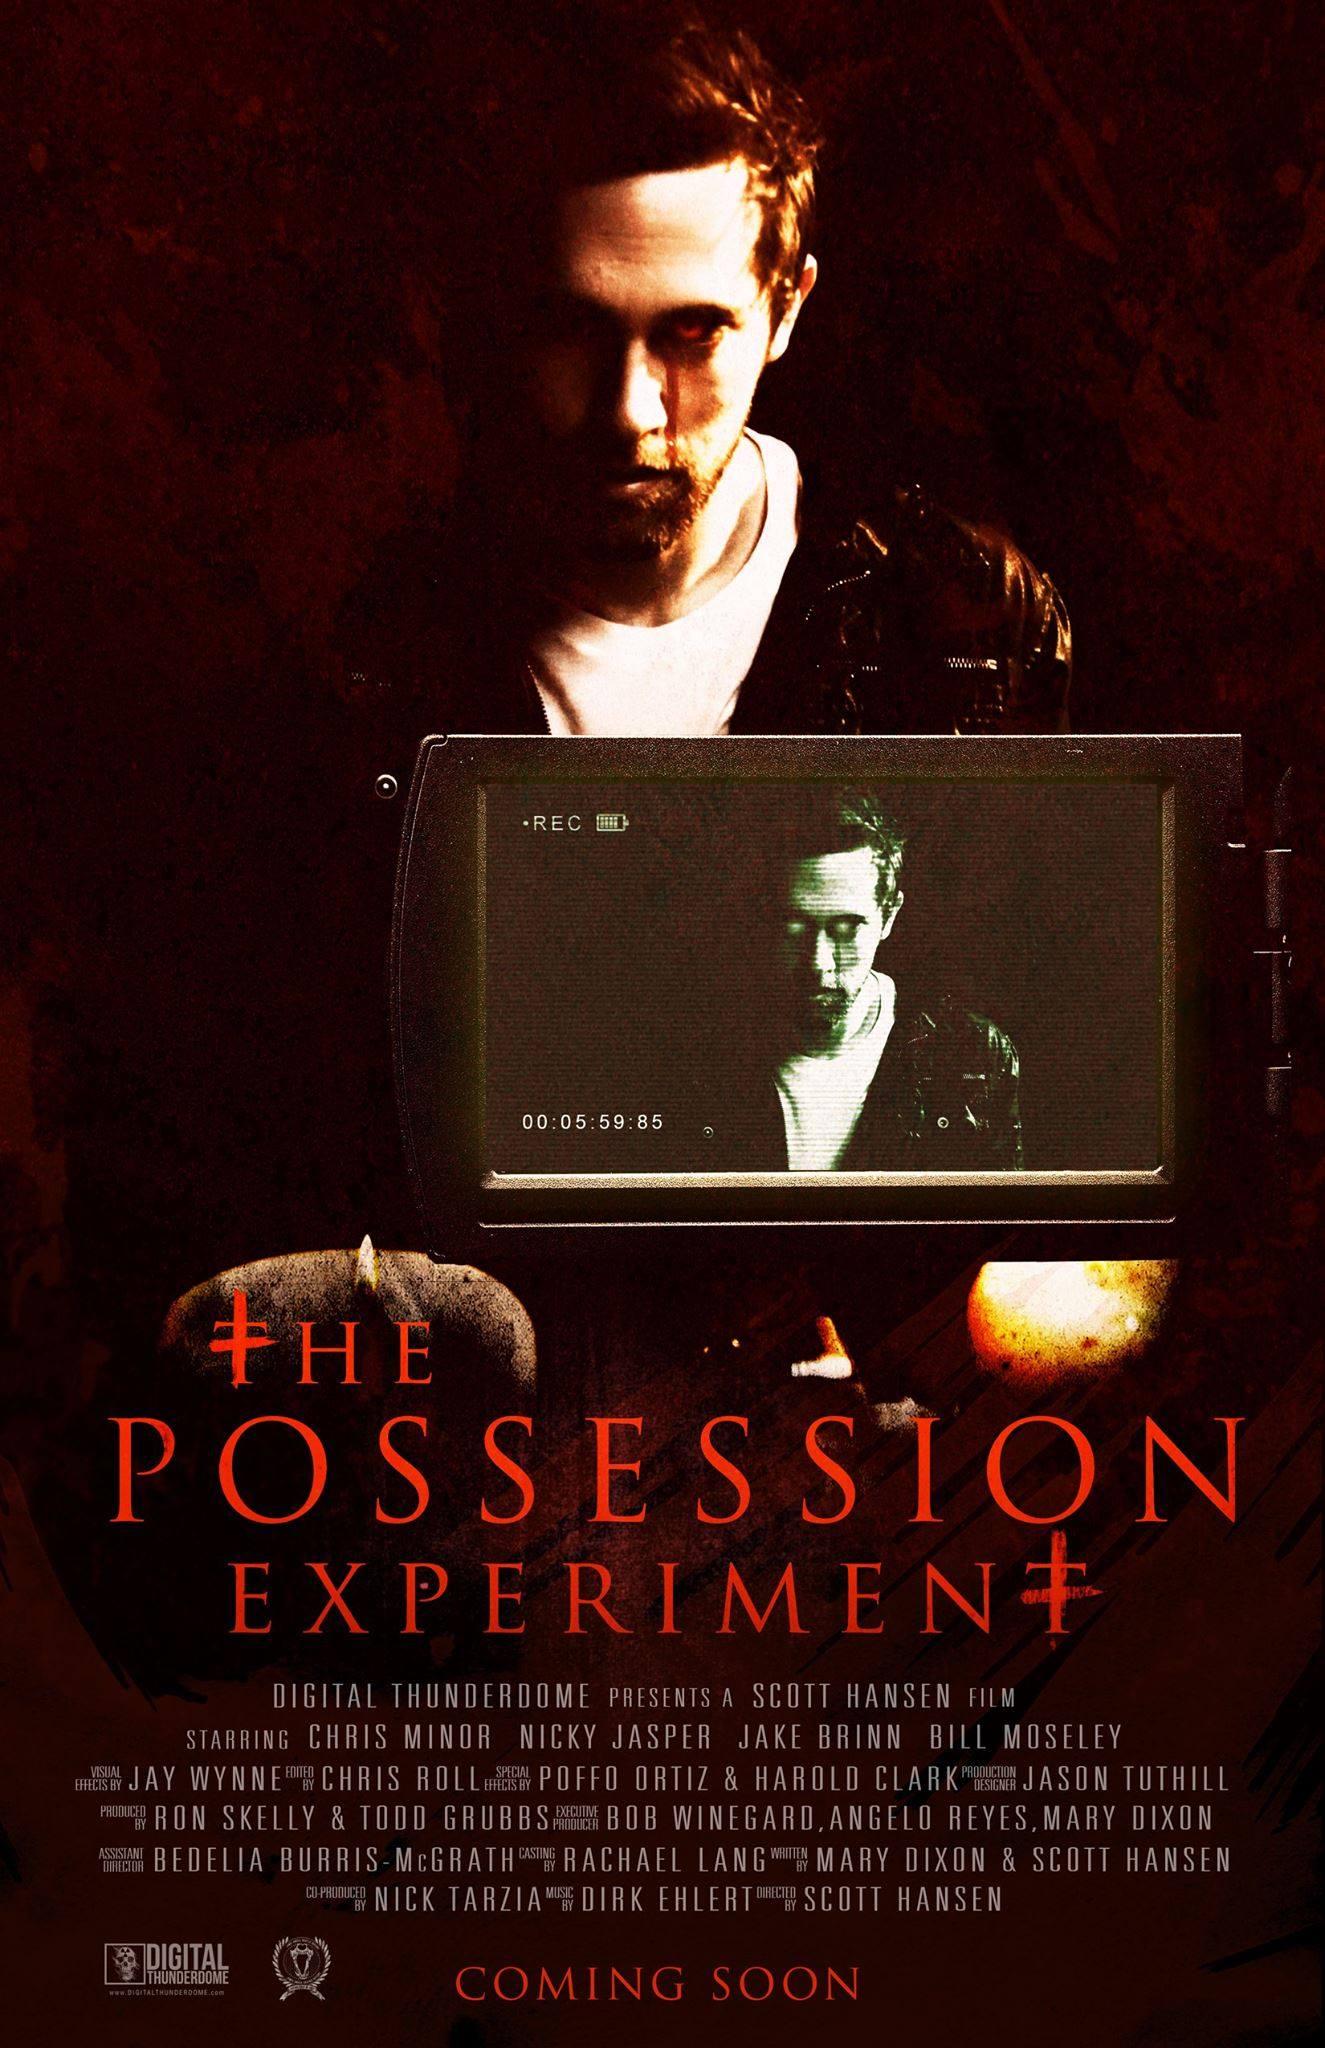 The Possesion Experiment 5.jpg